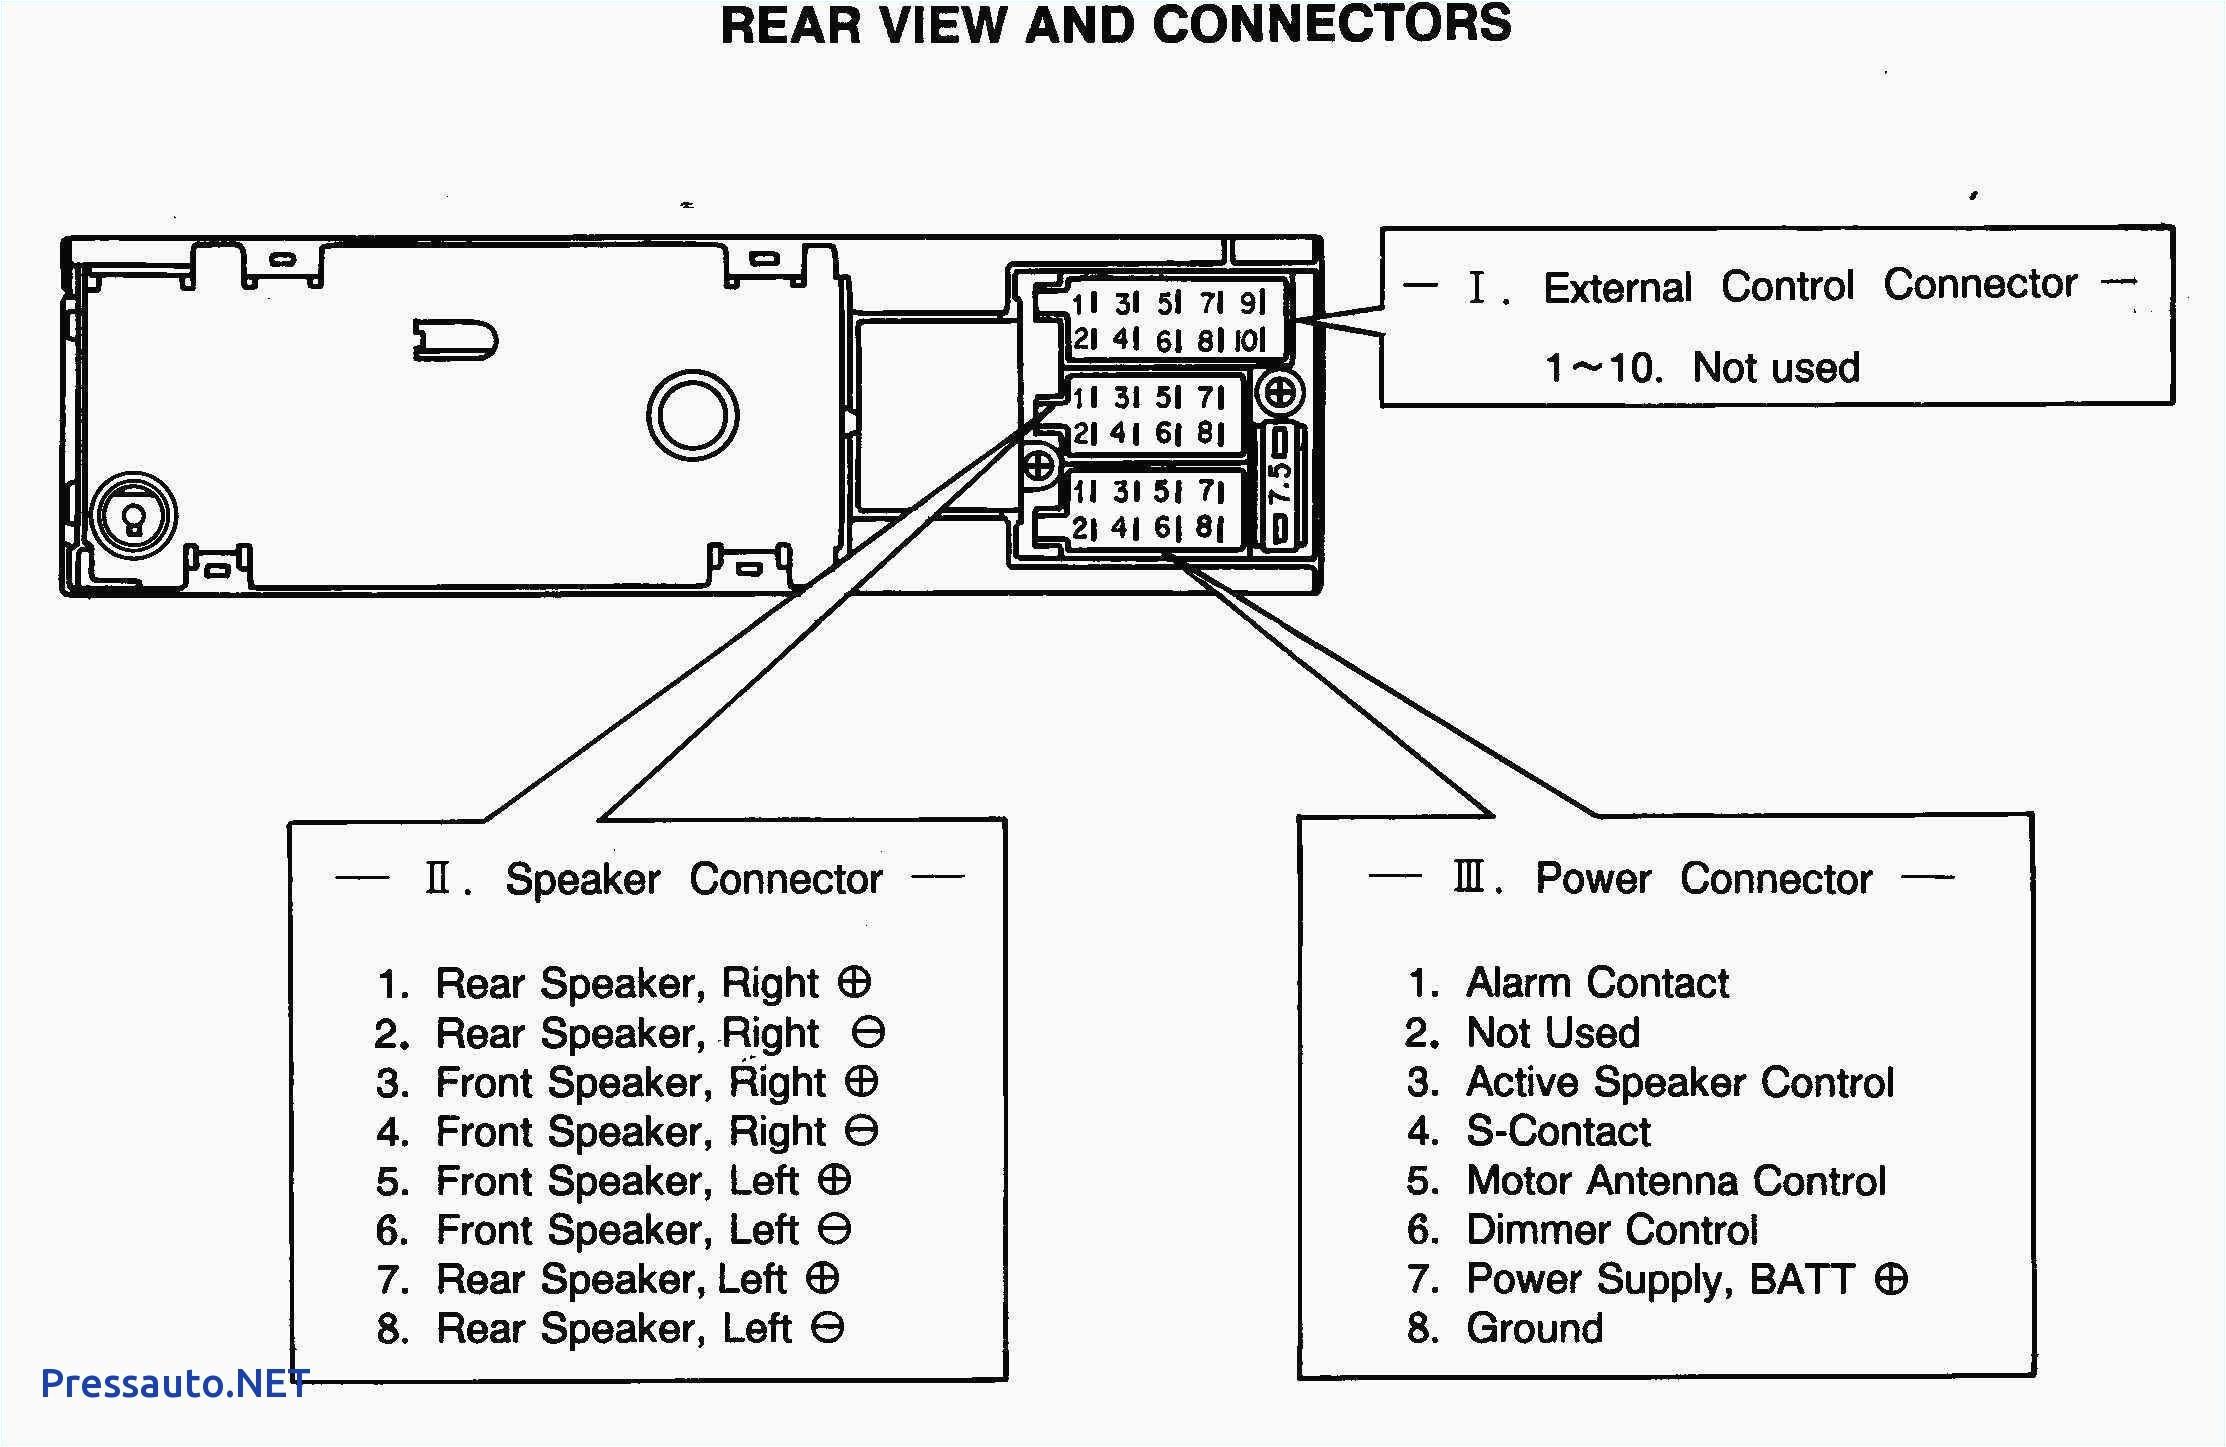 2002 audi a4 wiring diagram wiring diagram note wiring diagram for audi a4 radio 2003 audi a4 radio wiring